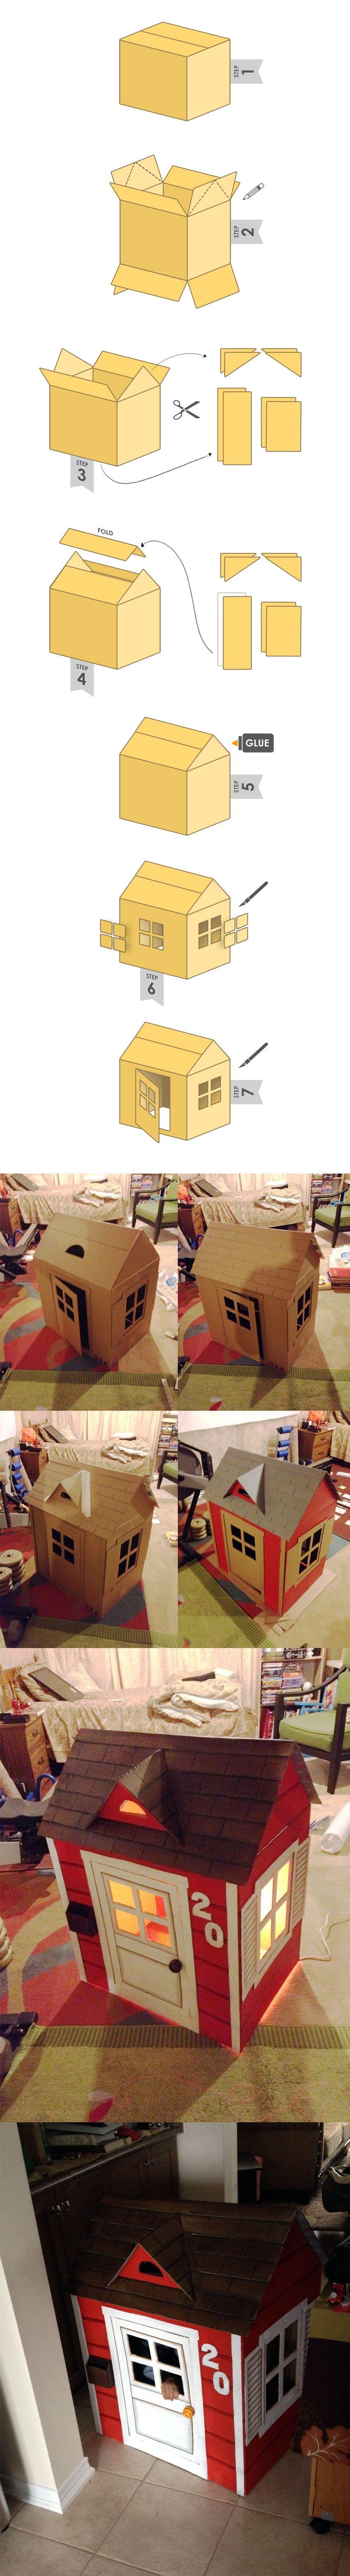 karton haus diy basteln mit kinder karton basteln. Black Bedroom Furniture Sets. Home Design Ideas